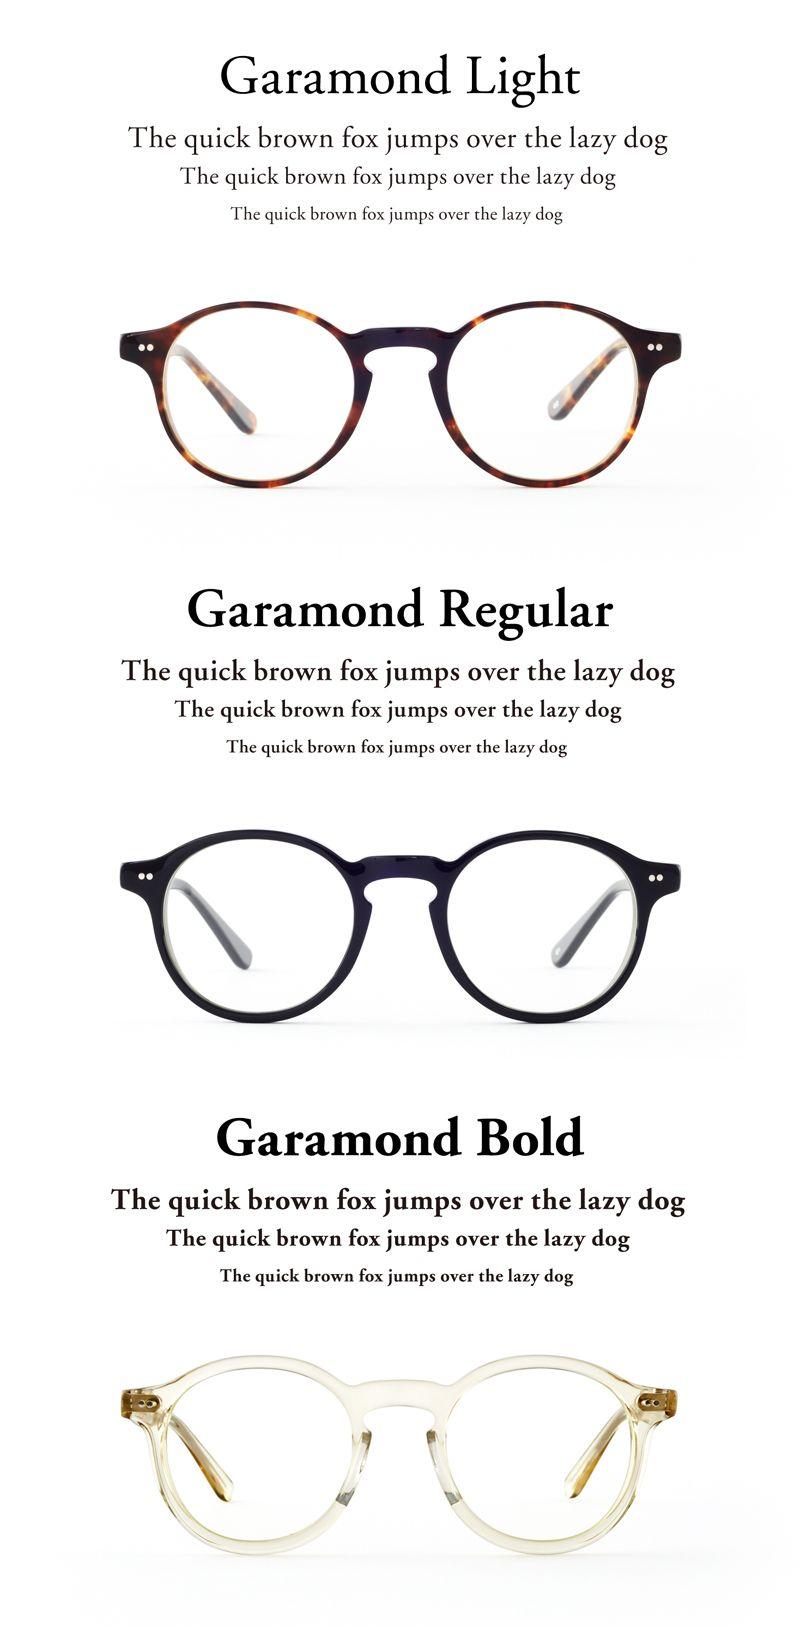 Ok  I reeally, REEAAALLLY, hope I never need glasses (Hi, everyone